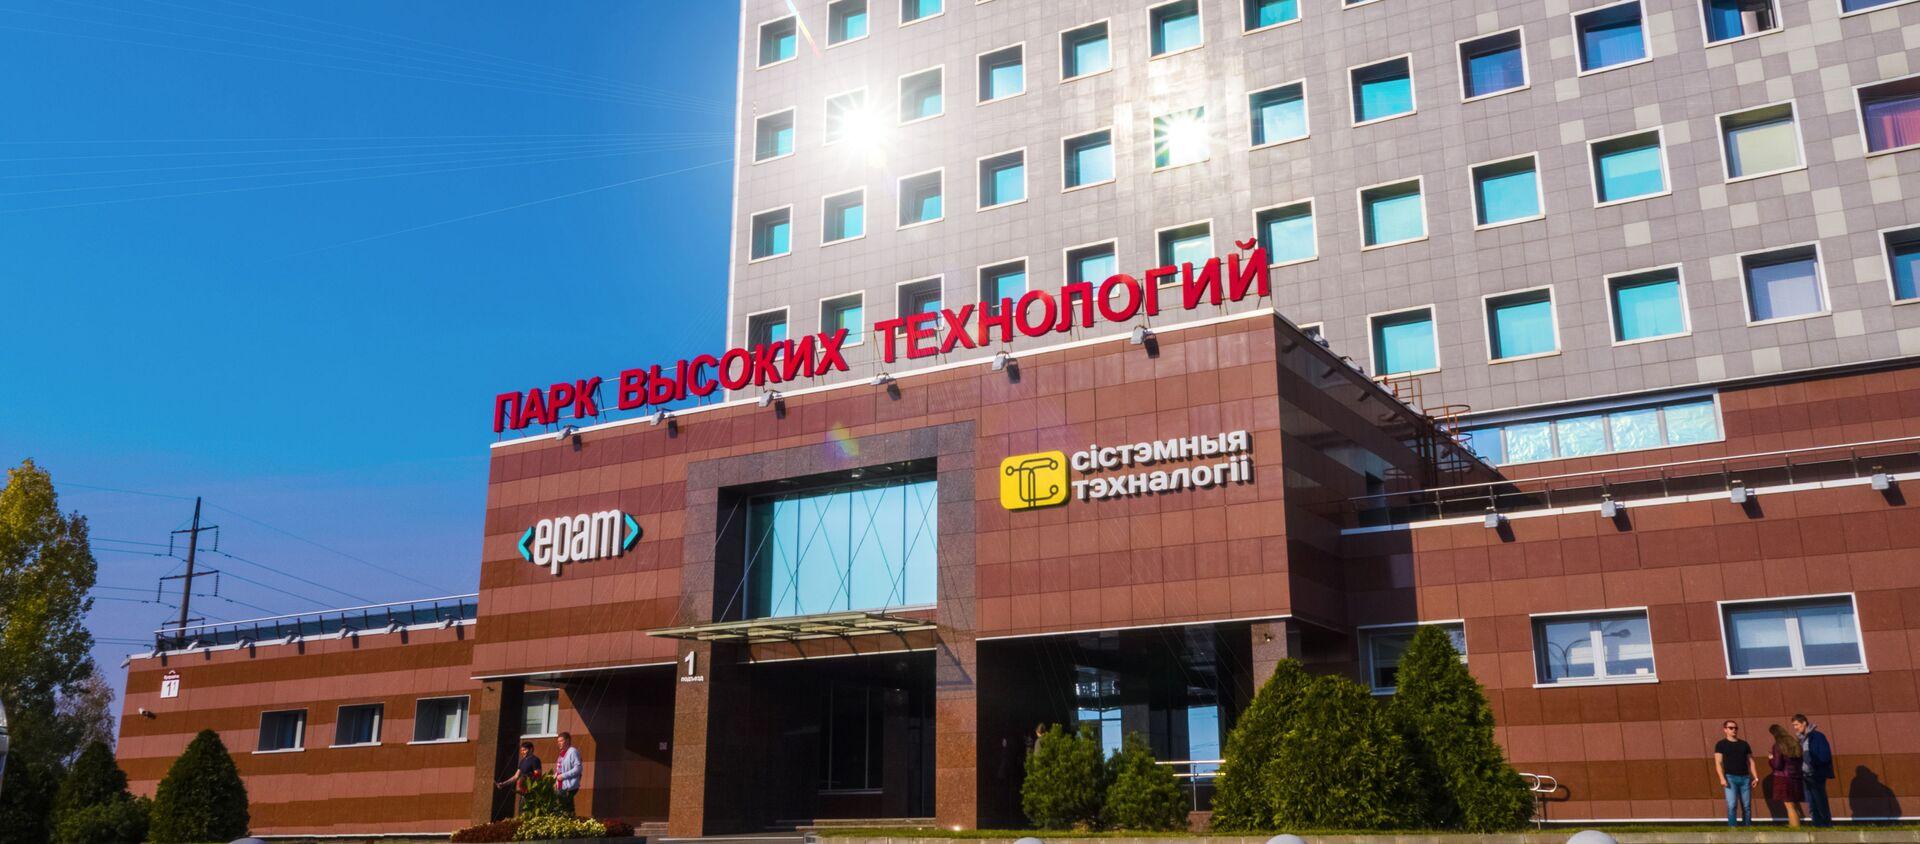 Будынак ПВТ - Sputnik Беларусь, 1920, 09.10.2020